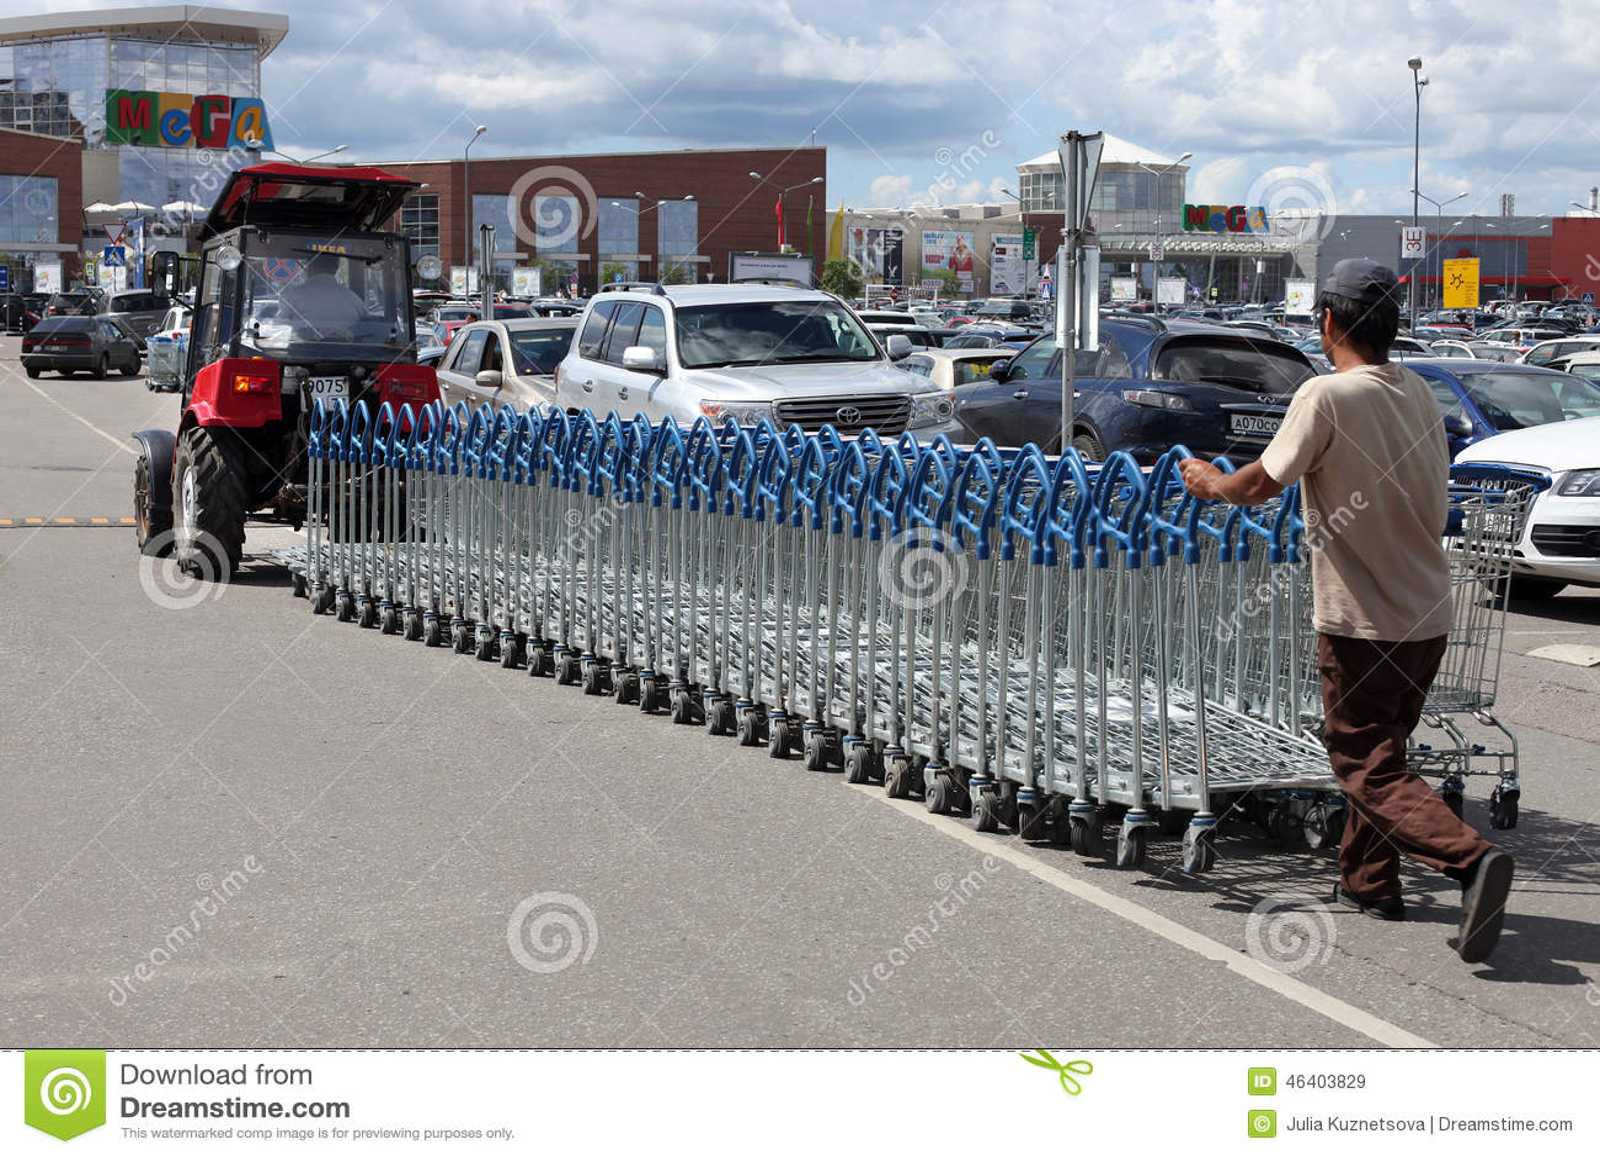 El tractor Bielorrusia tira de una fila de carros de la compra en el supermercado MEGA, Moscú